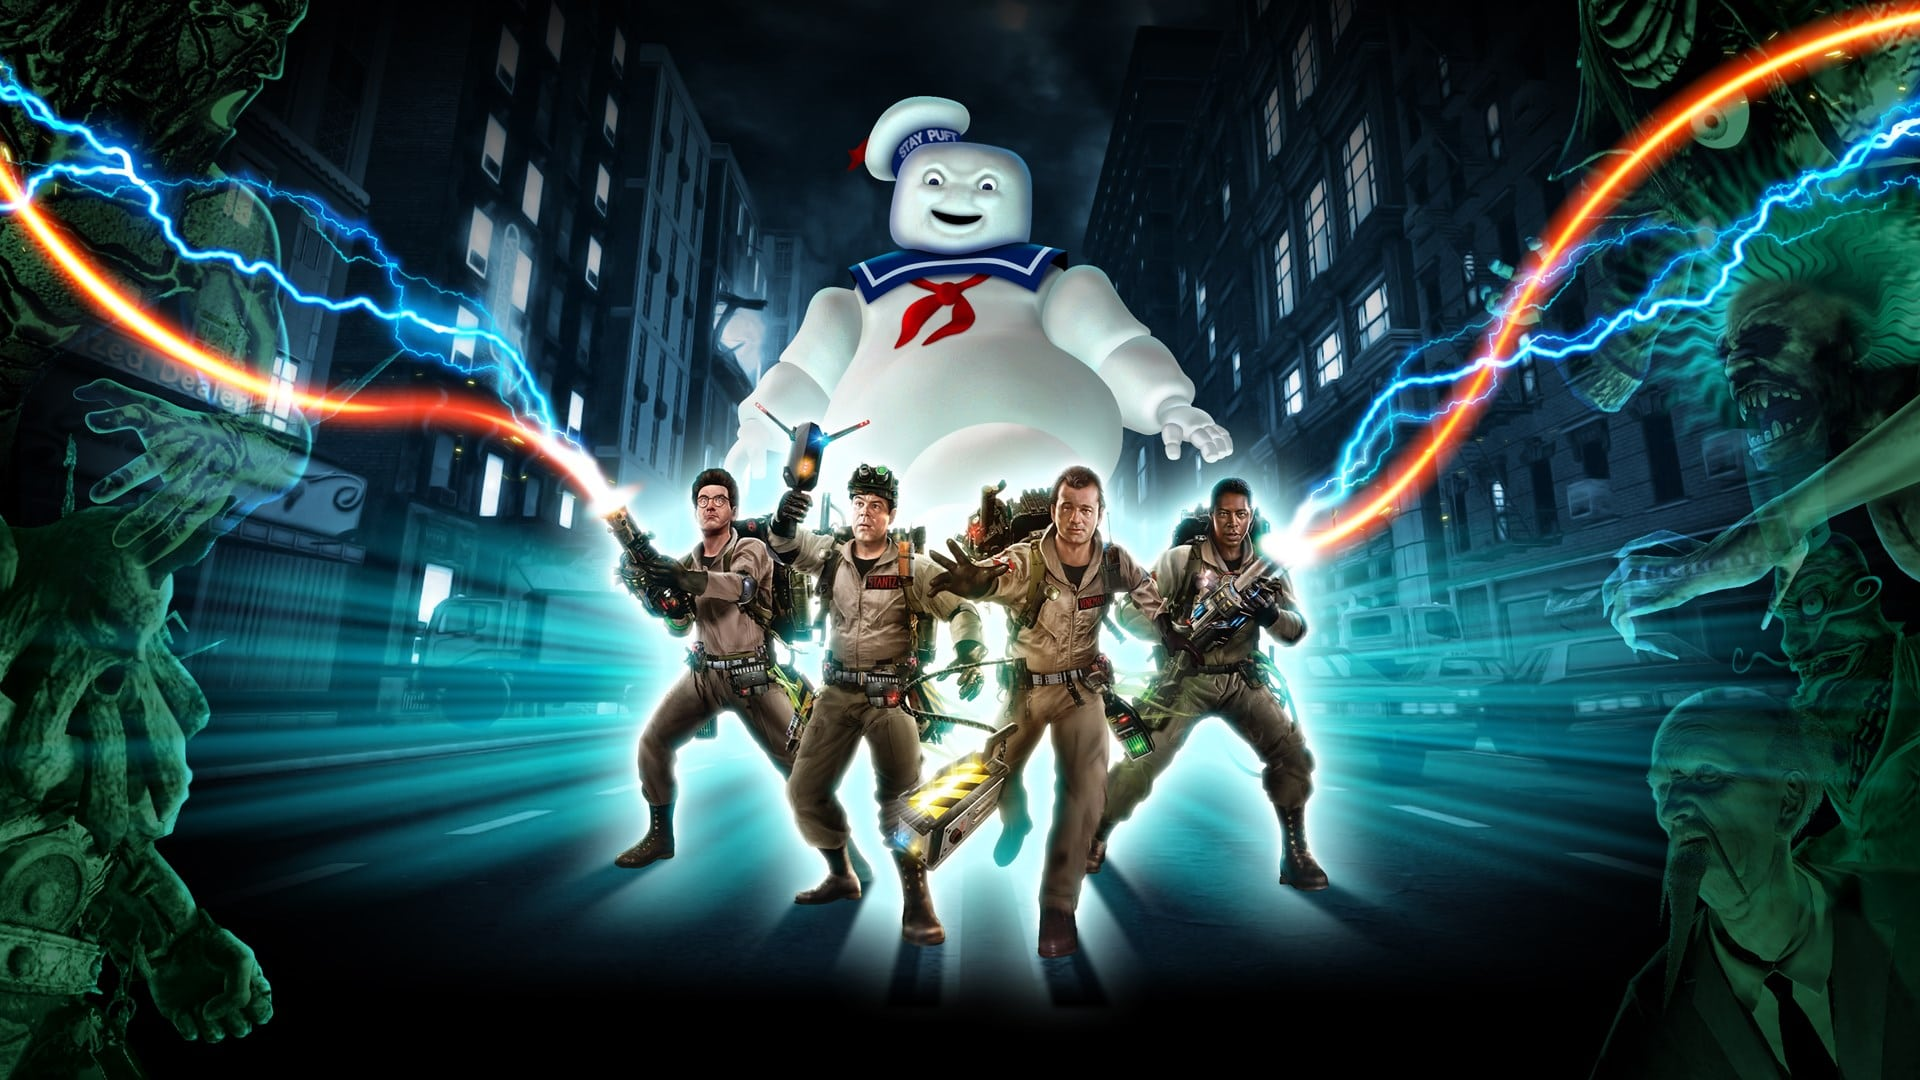 Ücretsiz Oyunlar Ghostbusters: The Video Game Remastered